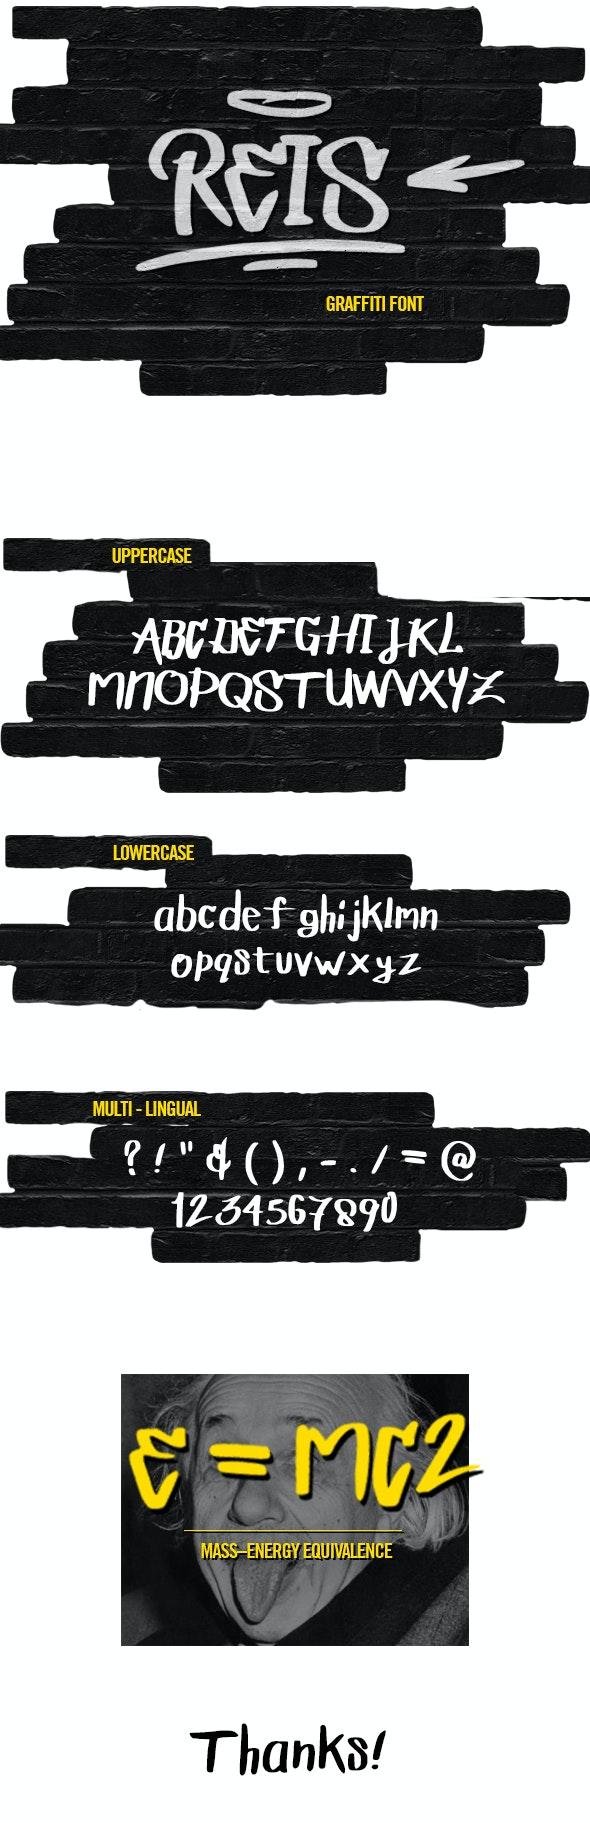 REIS GRAFFITI FONT - Graffiti Fonts